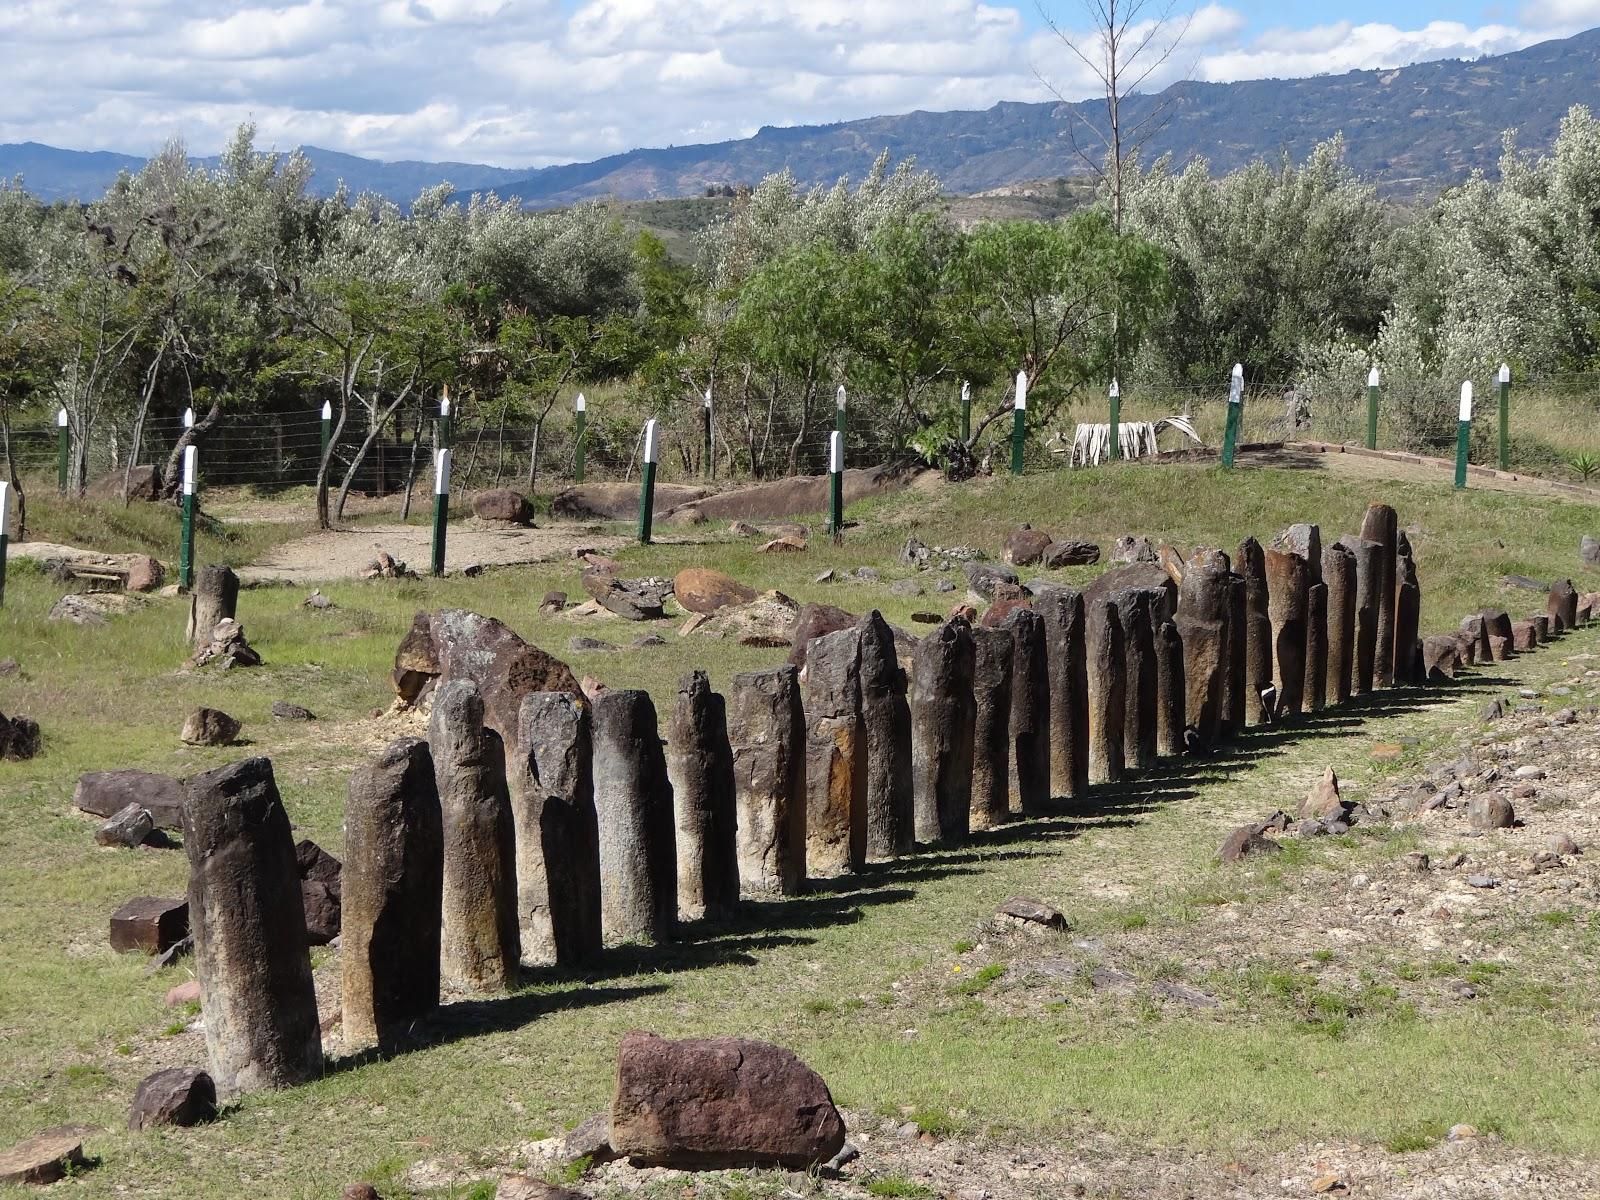 Parques arqueológicos. Foto: misviajeskamilokardona.blogspot.com